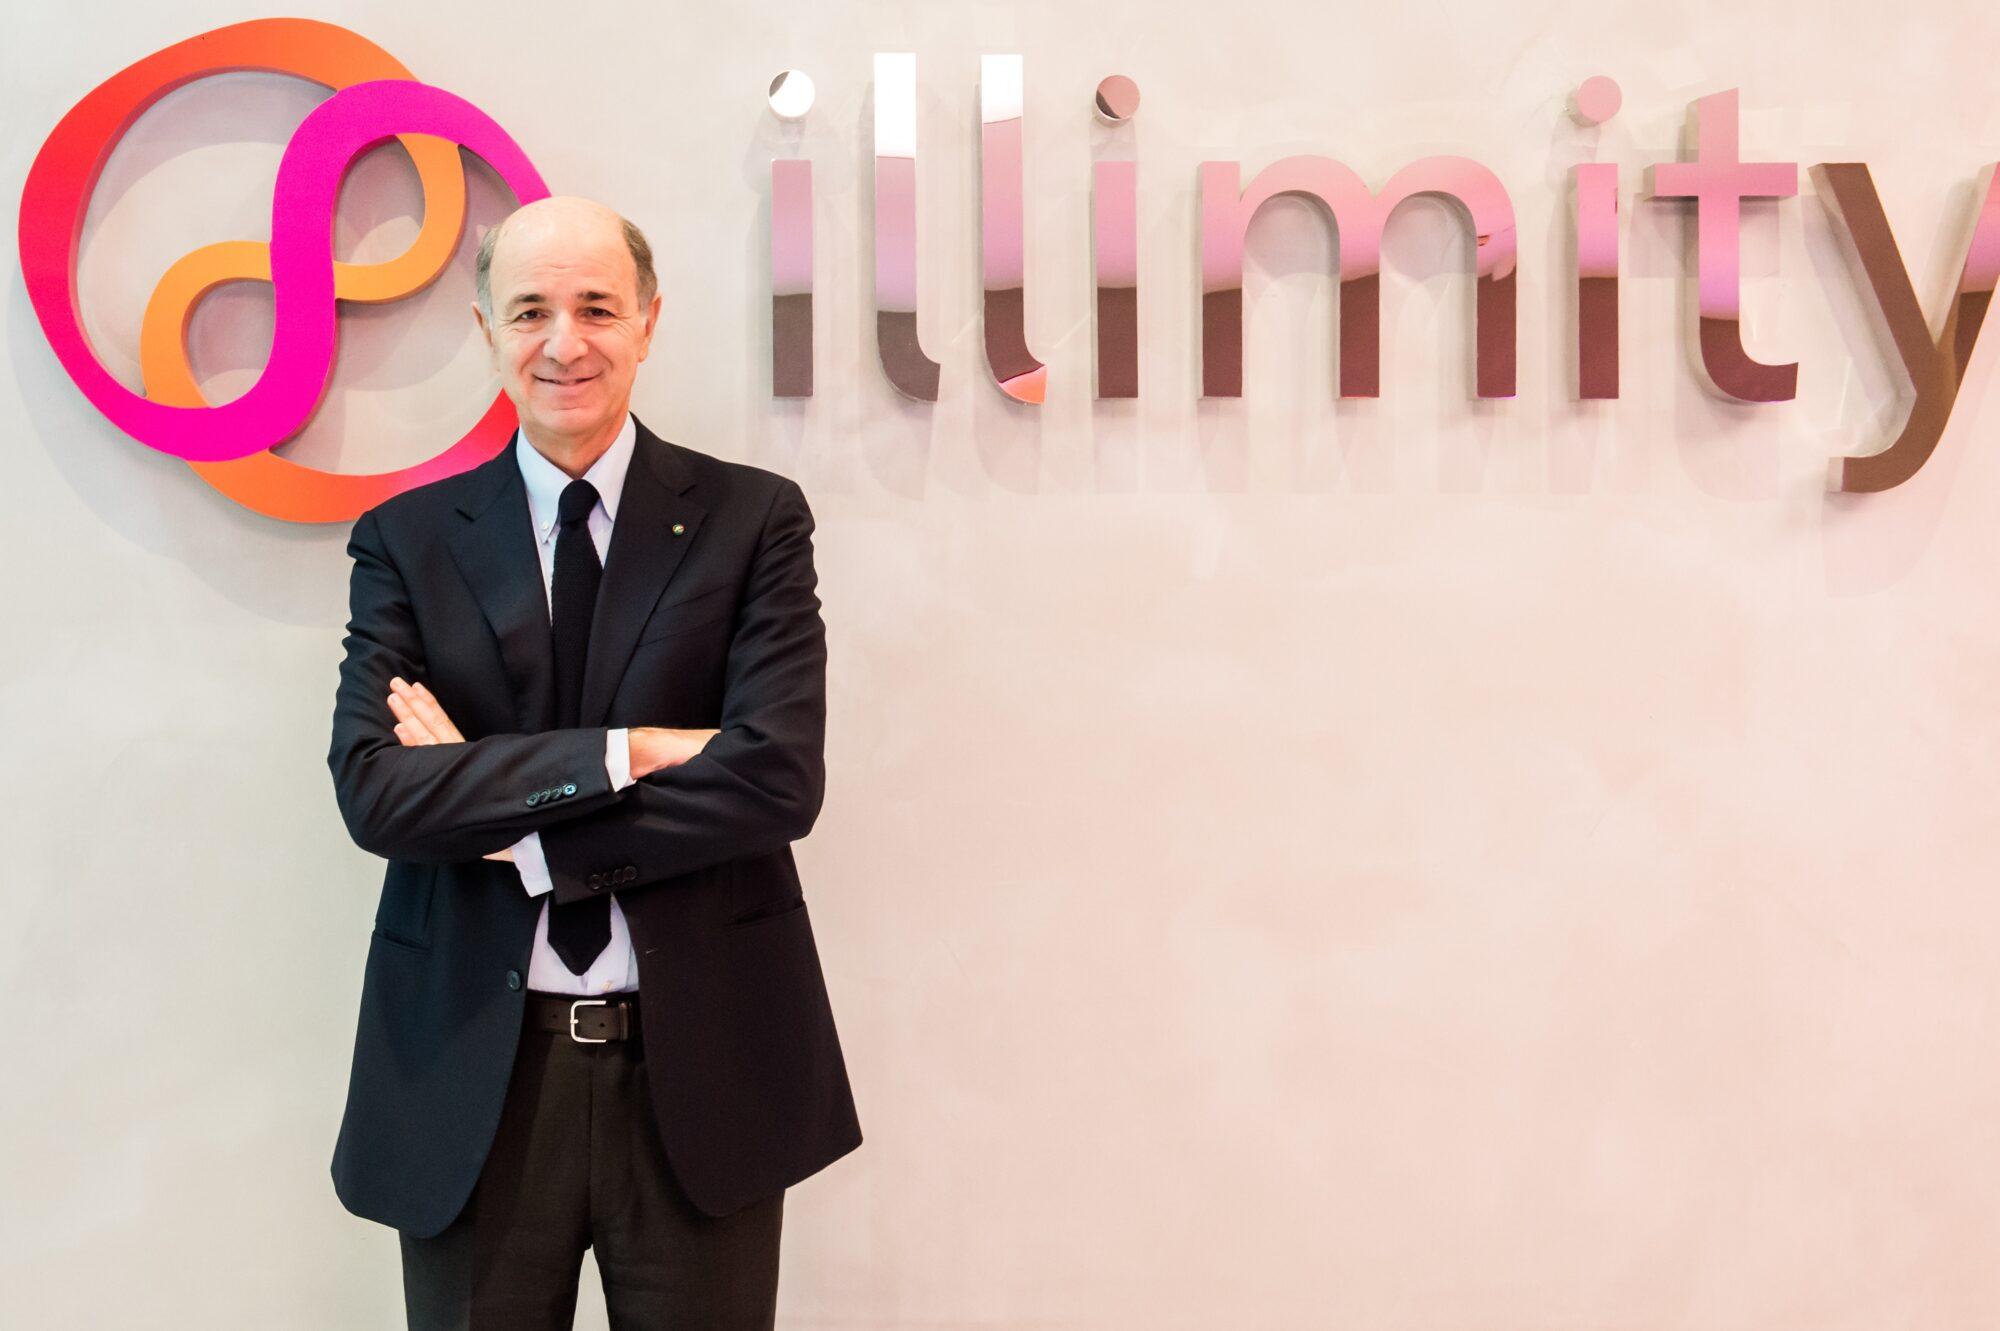 Illimitybank.com